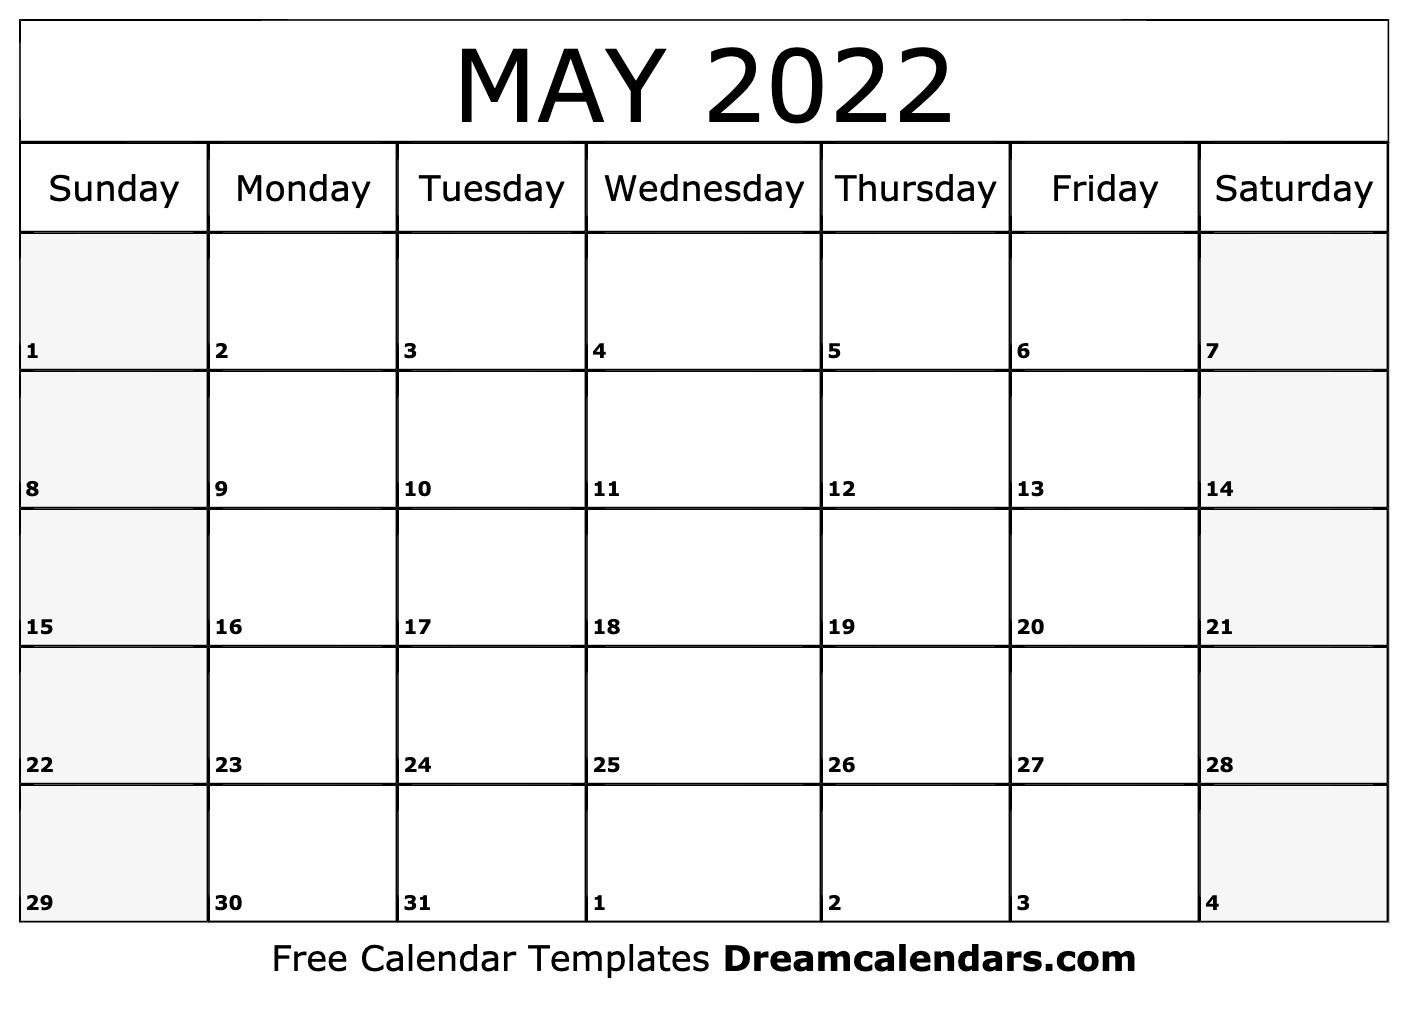 Blank May 2022 Calendar Printable.May 2022 Calendar Free Blank Printable Templates